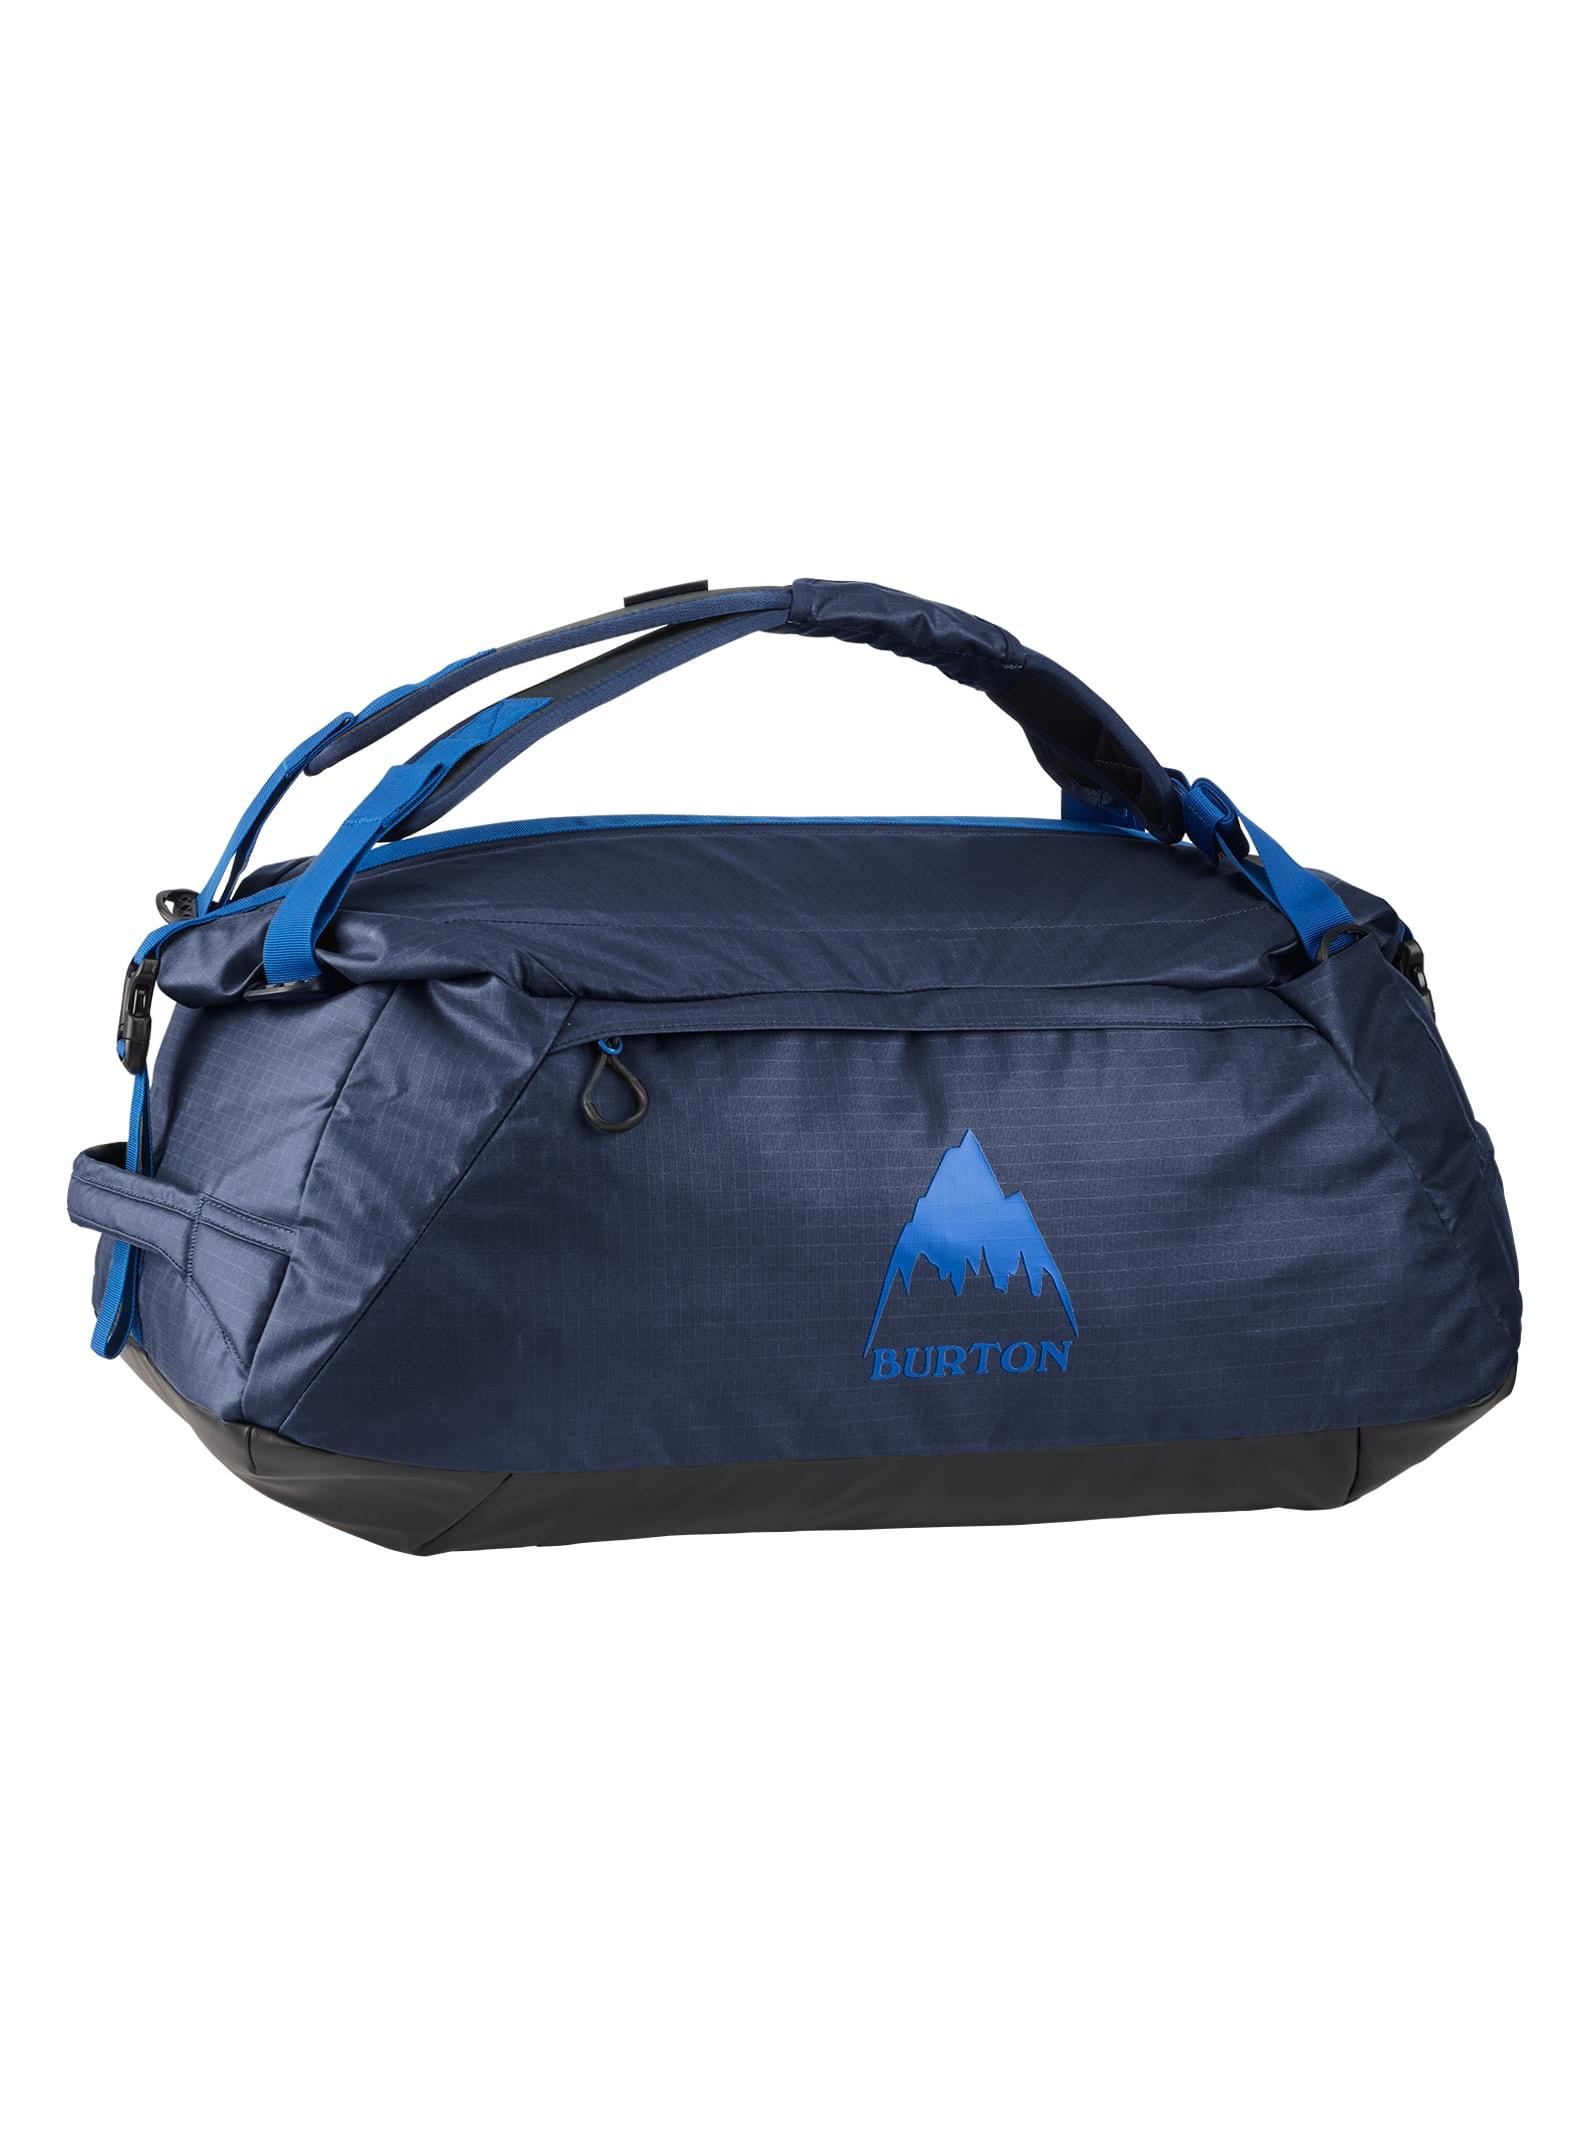 Best Duffel Bags 2020 Burton Multipath Duffel Bag 60L+ | Burton.Winter 2020